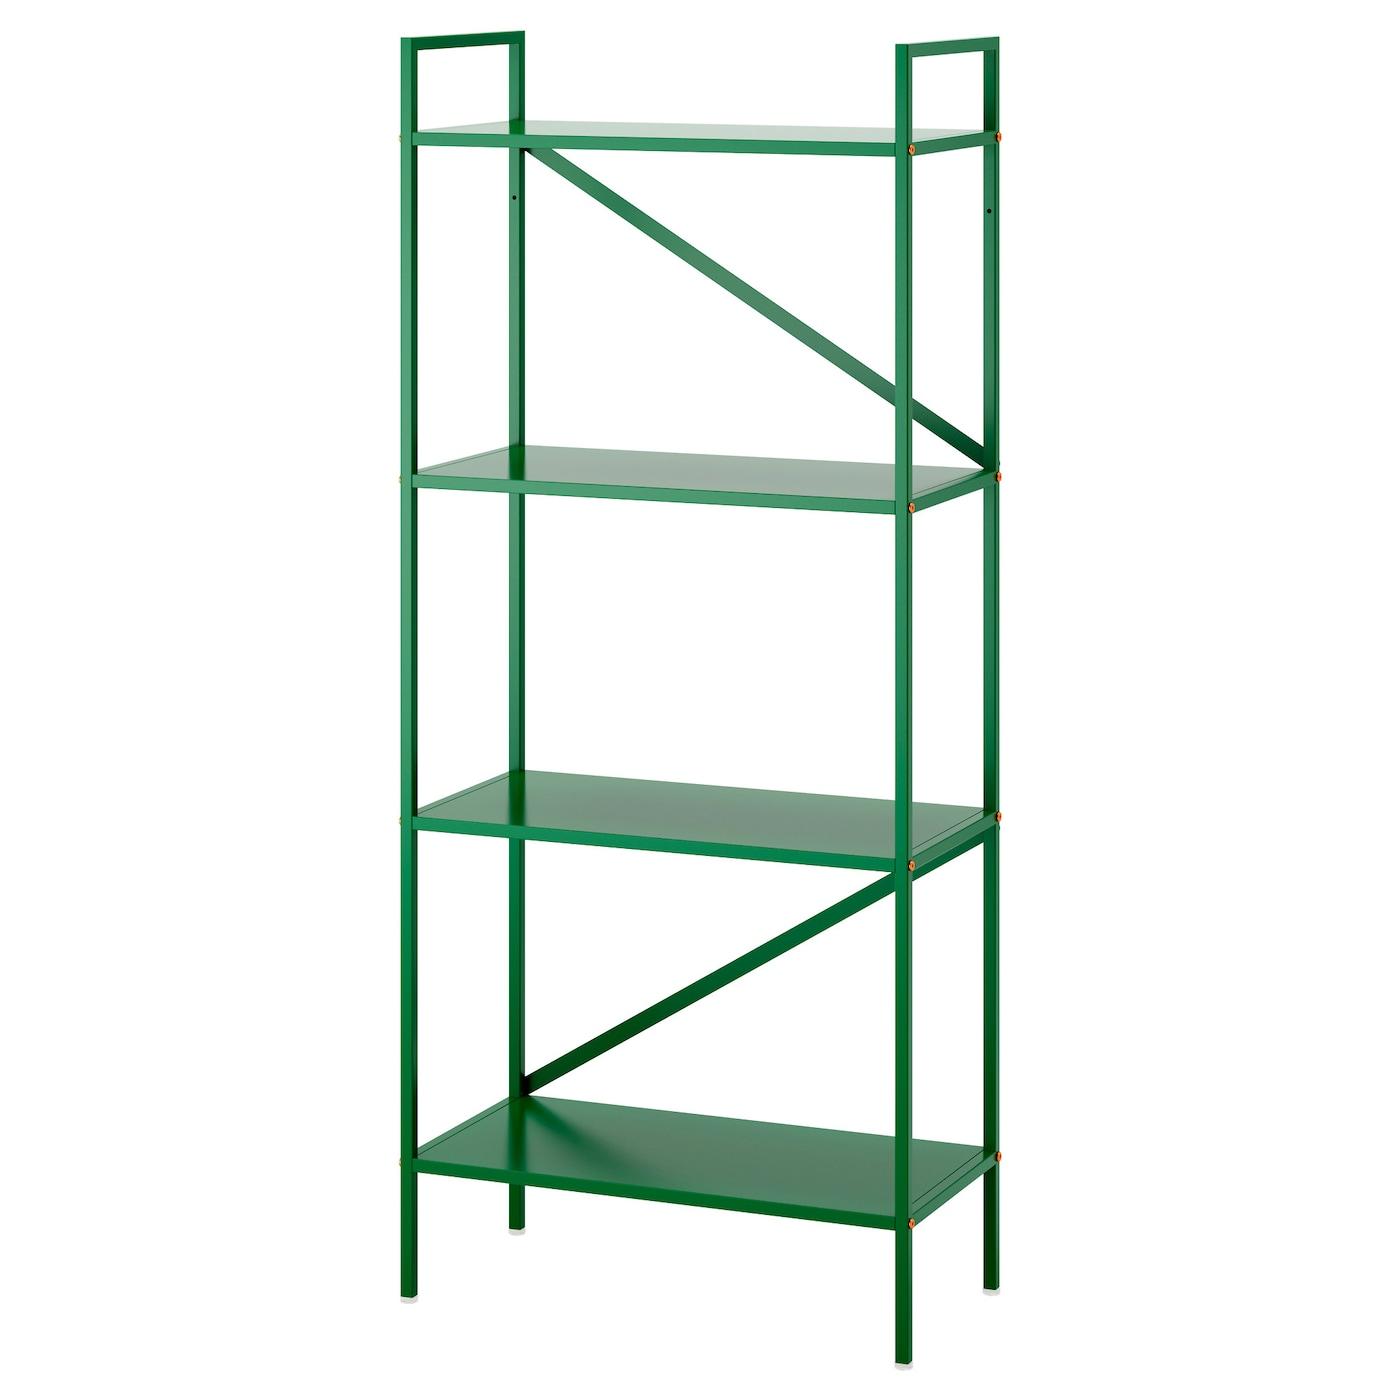 Draget shelving unit green 60x140 cm ikea for Ikea draget